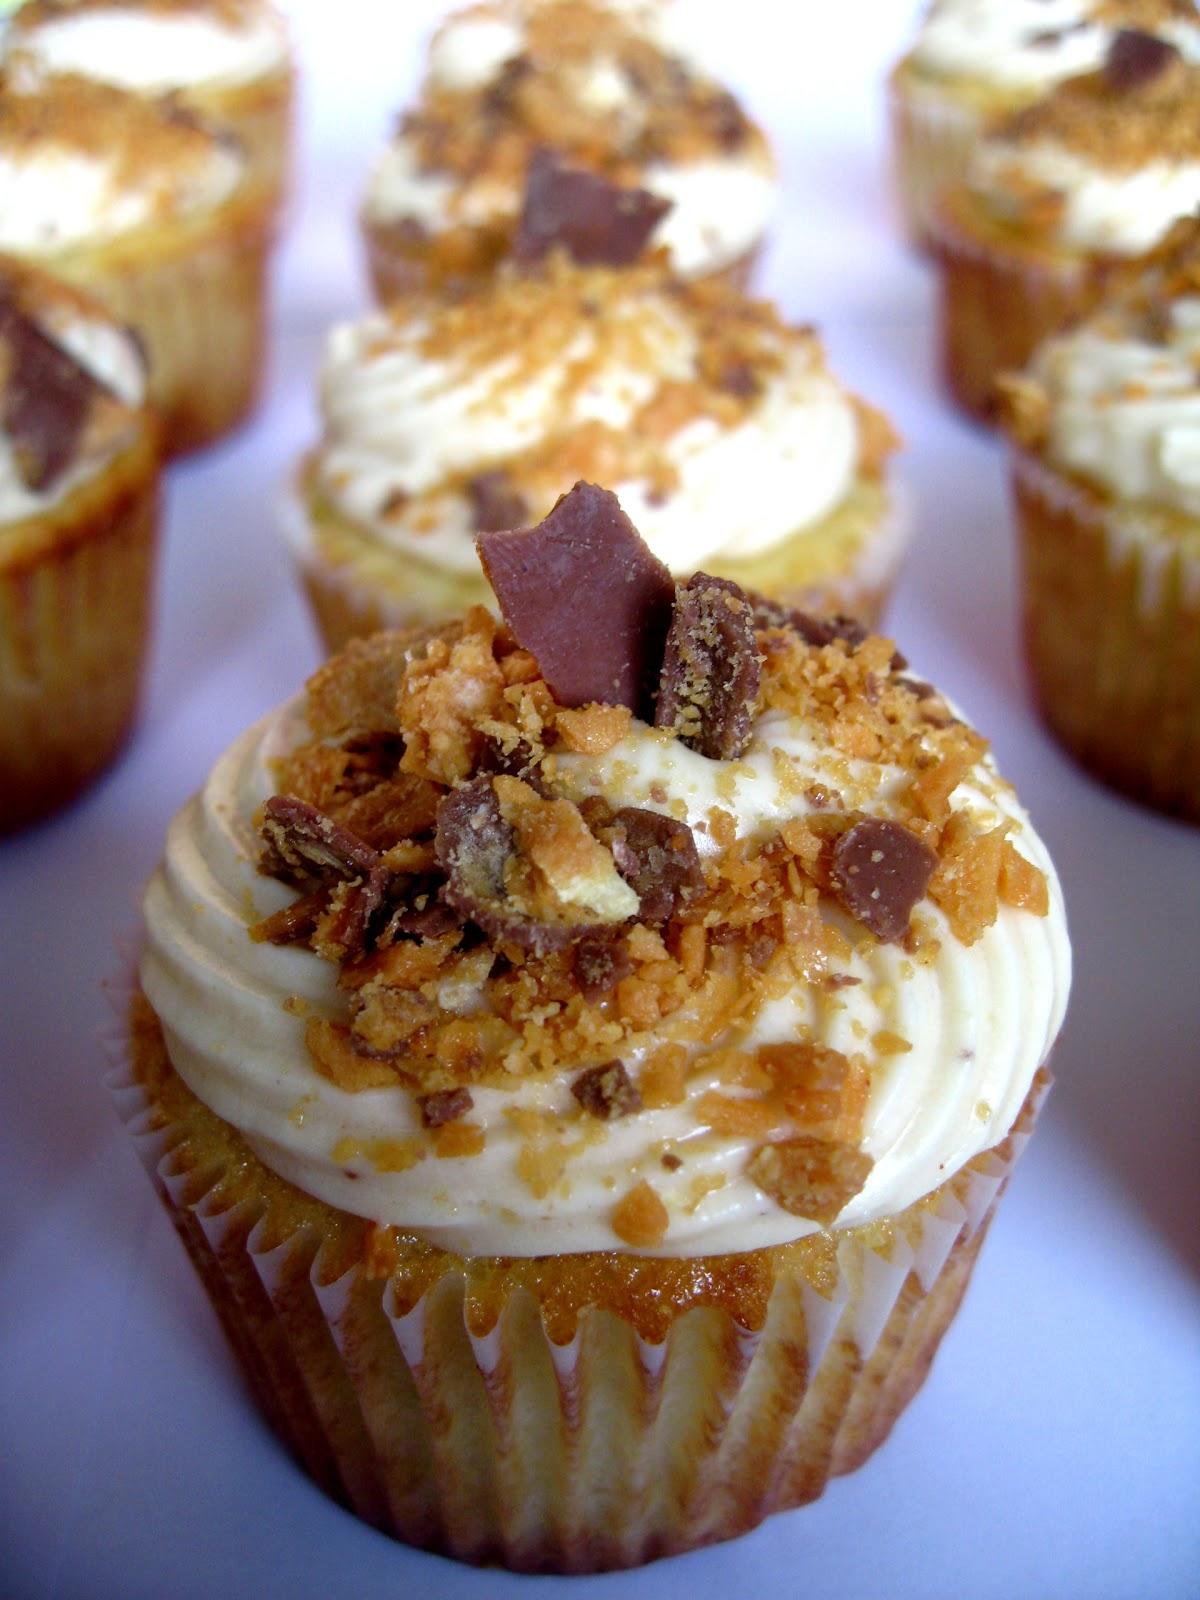 Peanut_Butter_Banana_Butterfinger_Cupcakes3.JPG